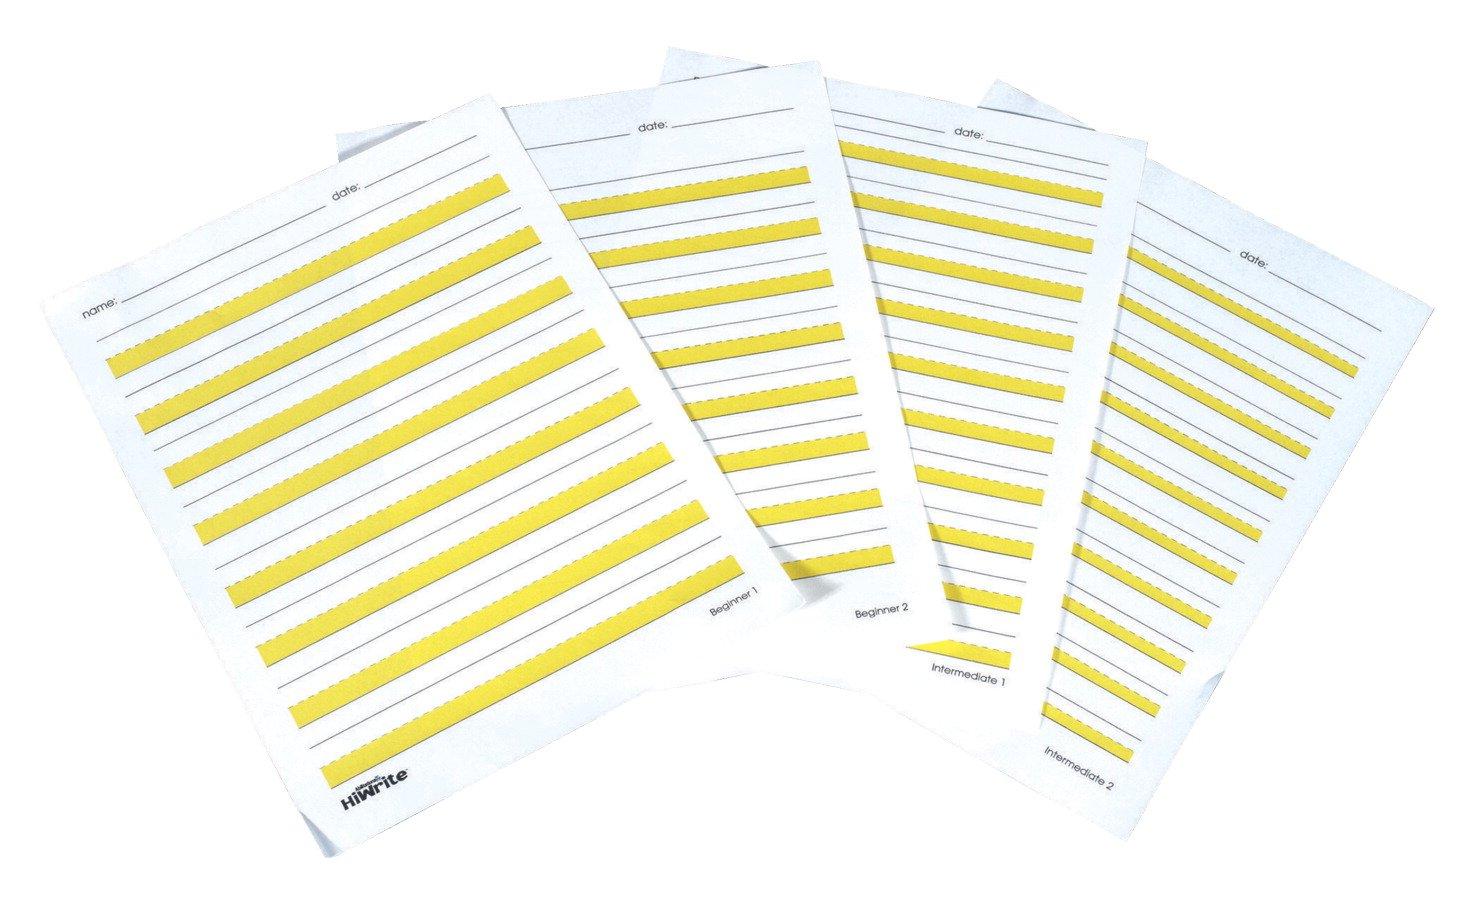 Abilitations Hi-Write Intermediate Paper, Level 2, Pack of 100-027323 by Abilitations